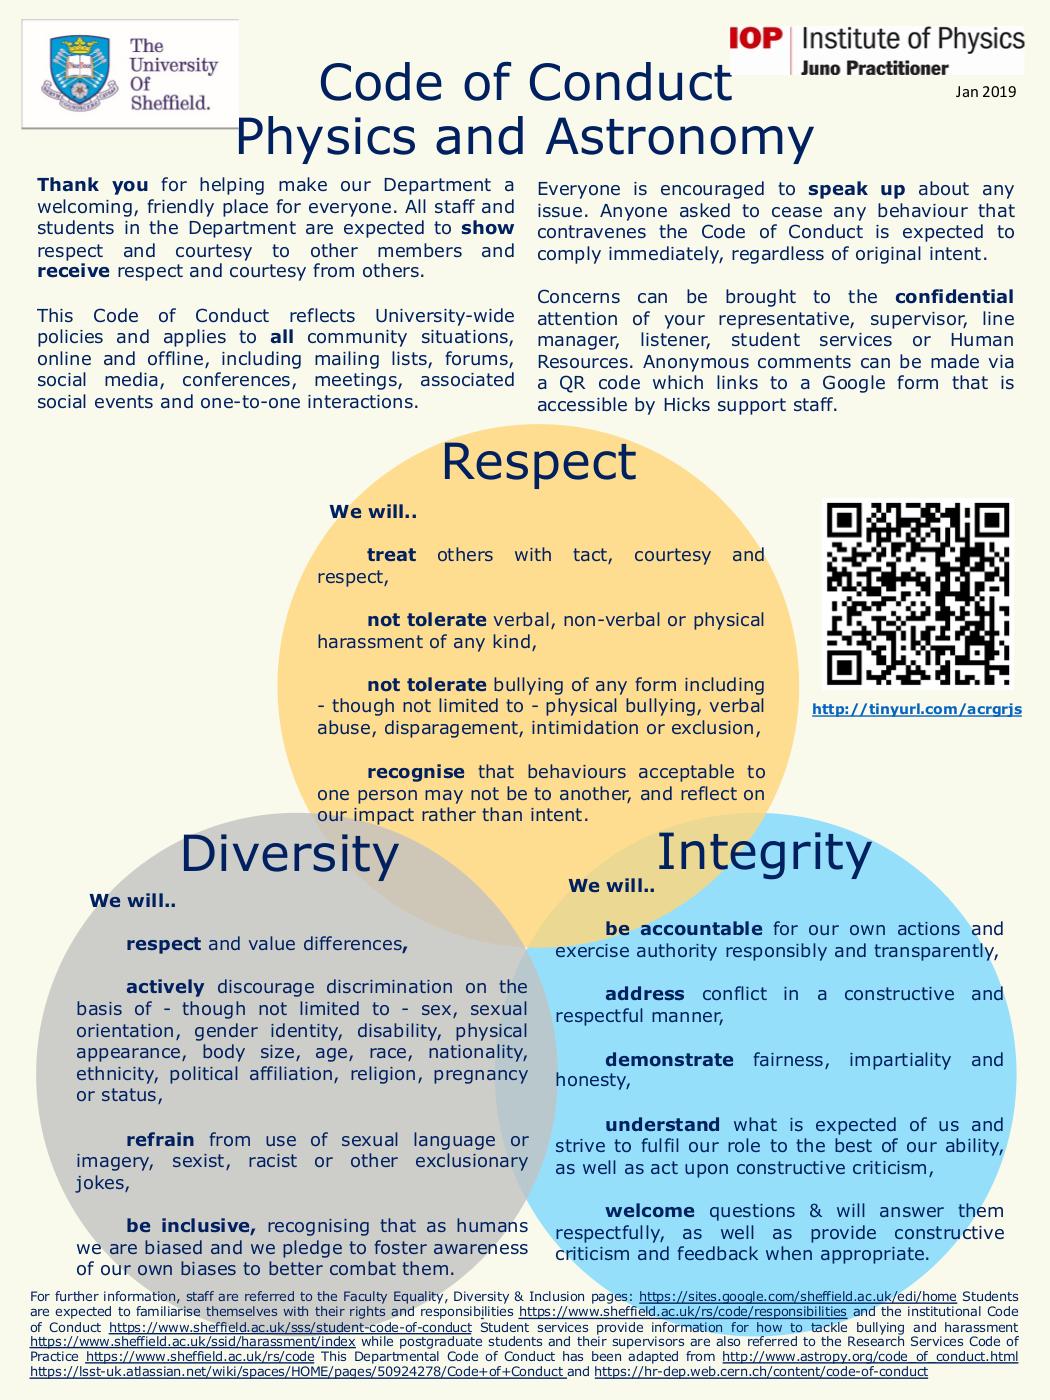 CoC_Poster_2Jan19_Verdana.png